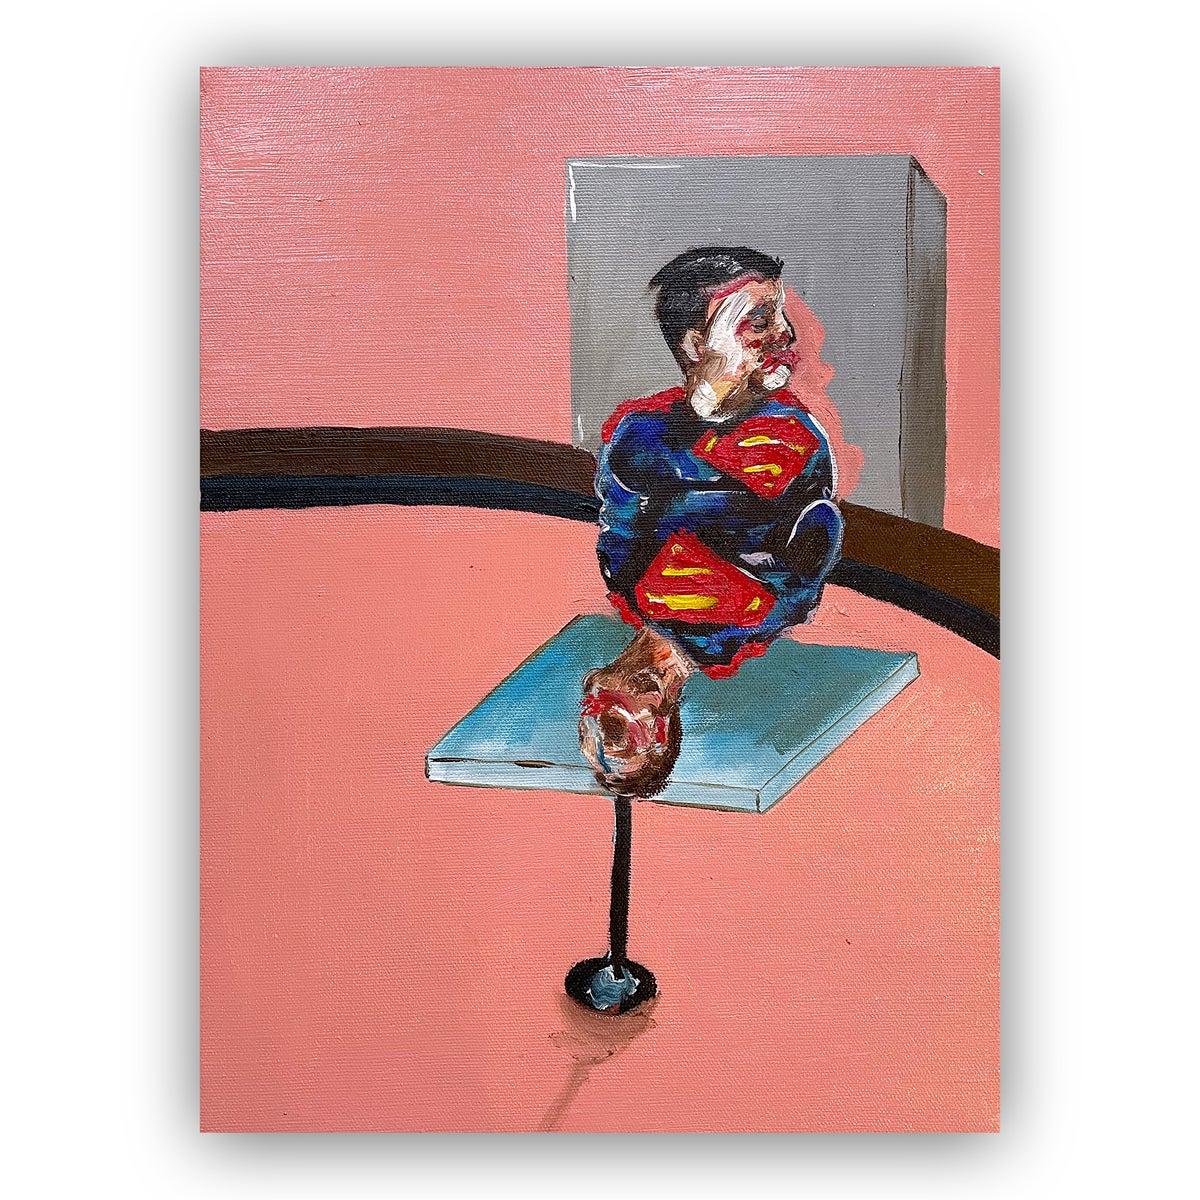 Clark Kent or Clark Can't